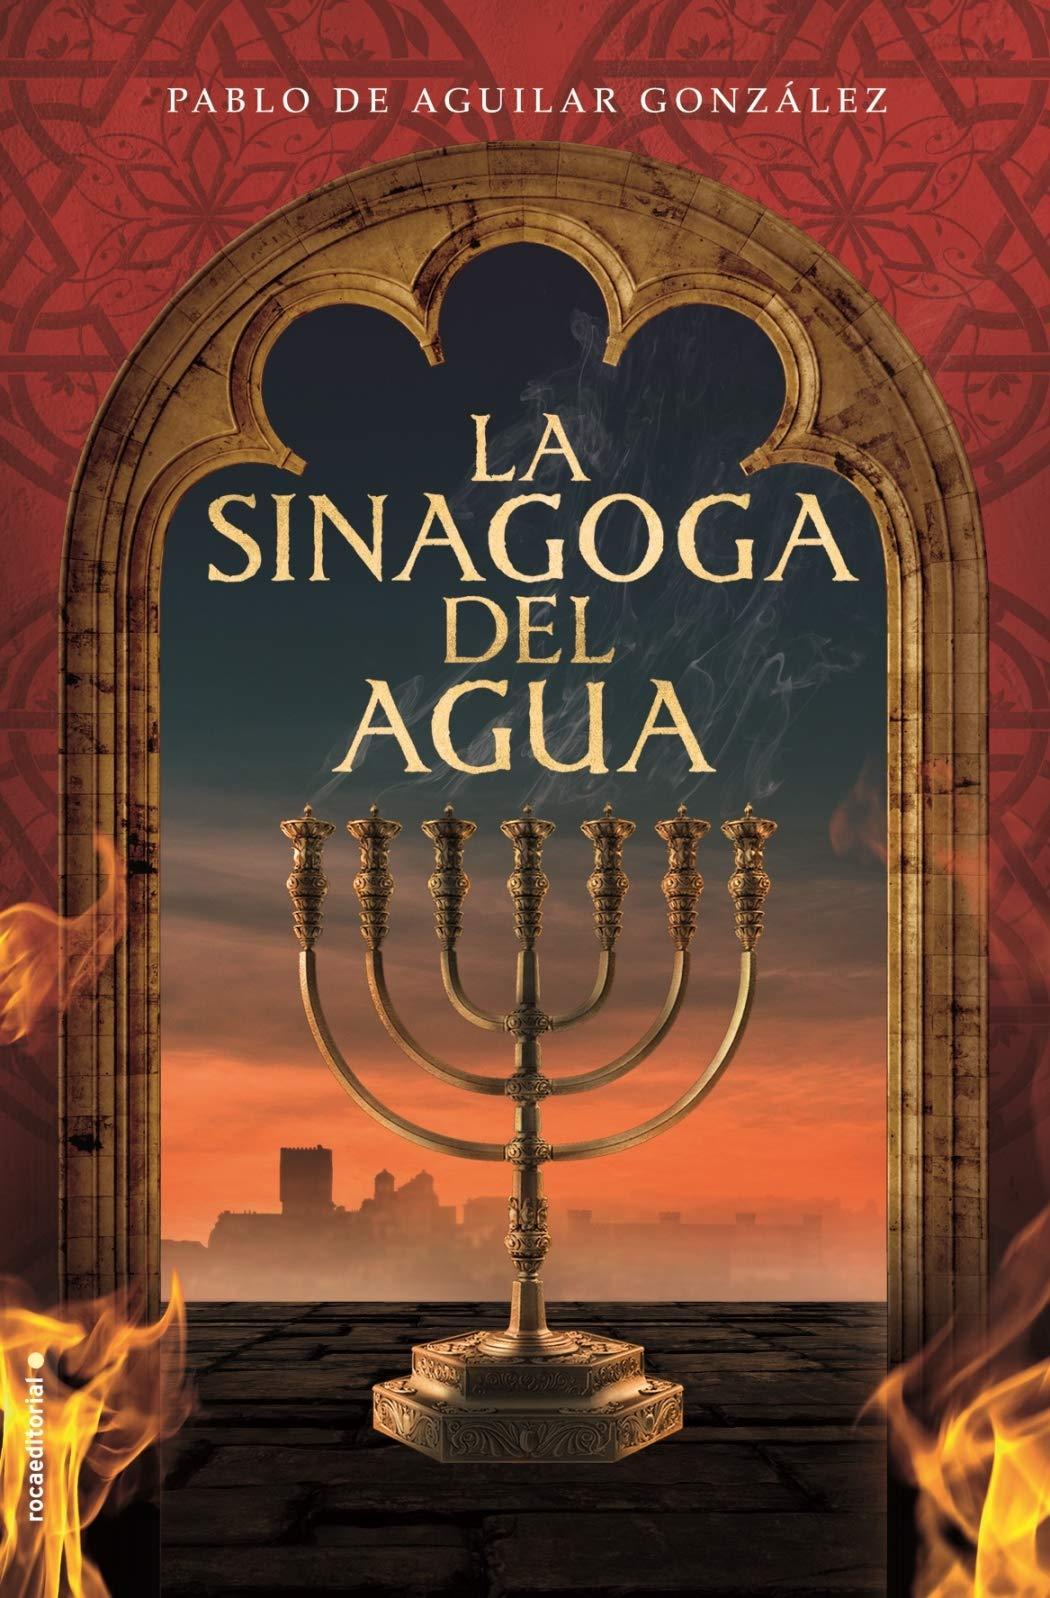 La Sinagoga Del Agua Histórica Spanish Edition De Aguilar González Pablo 9788417305994 Books